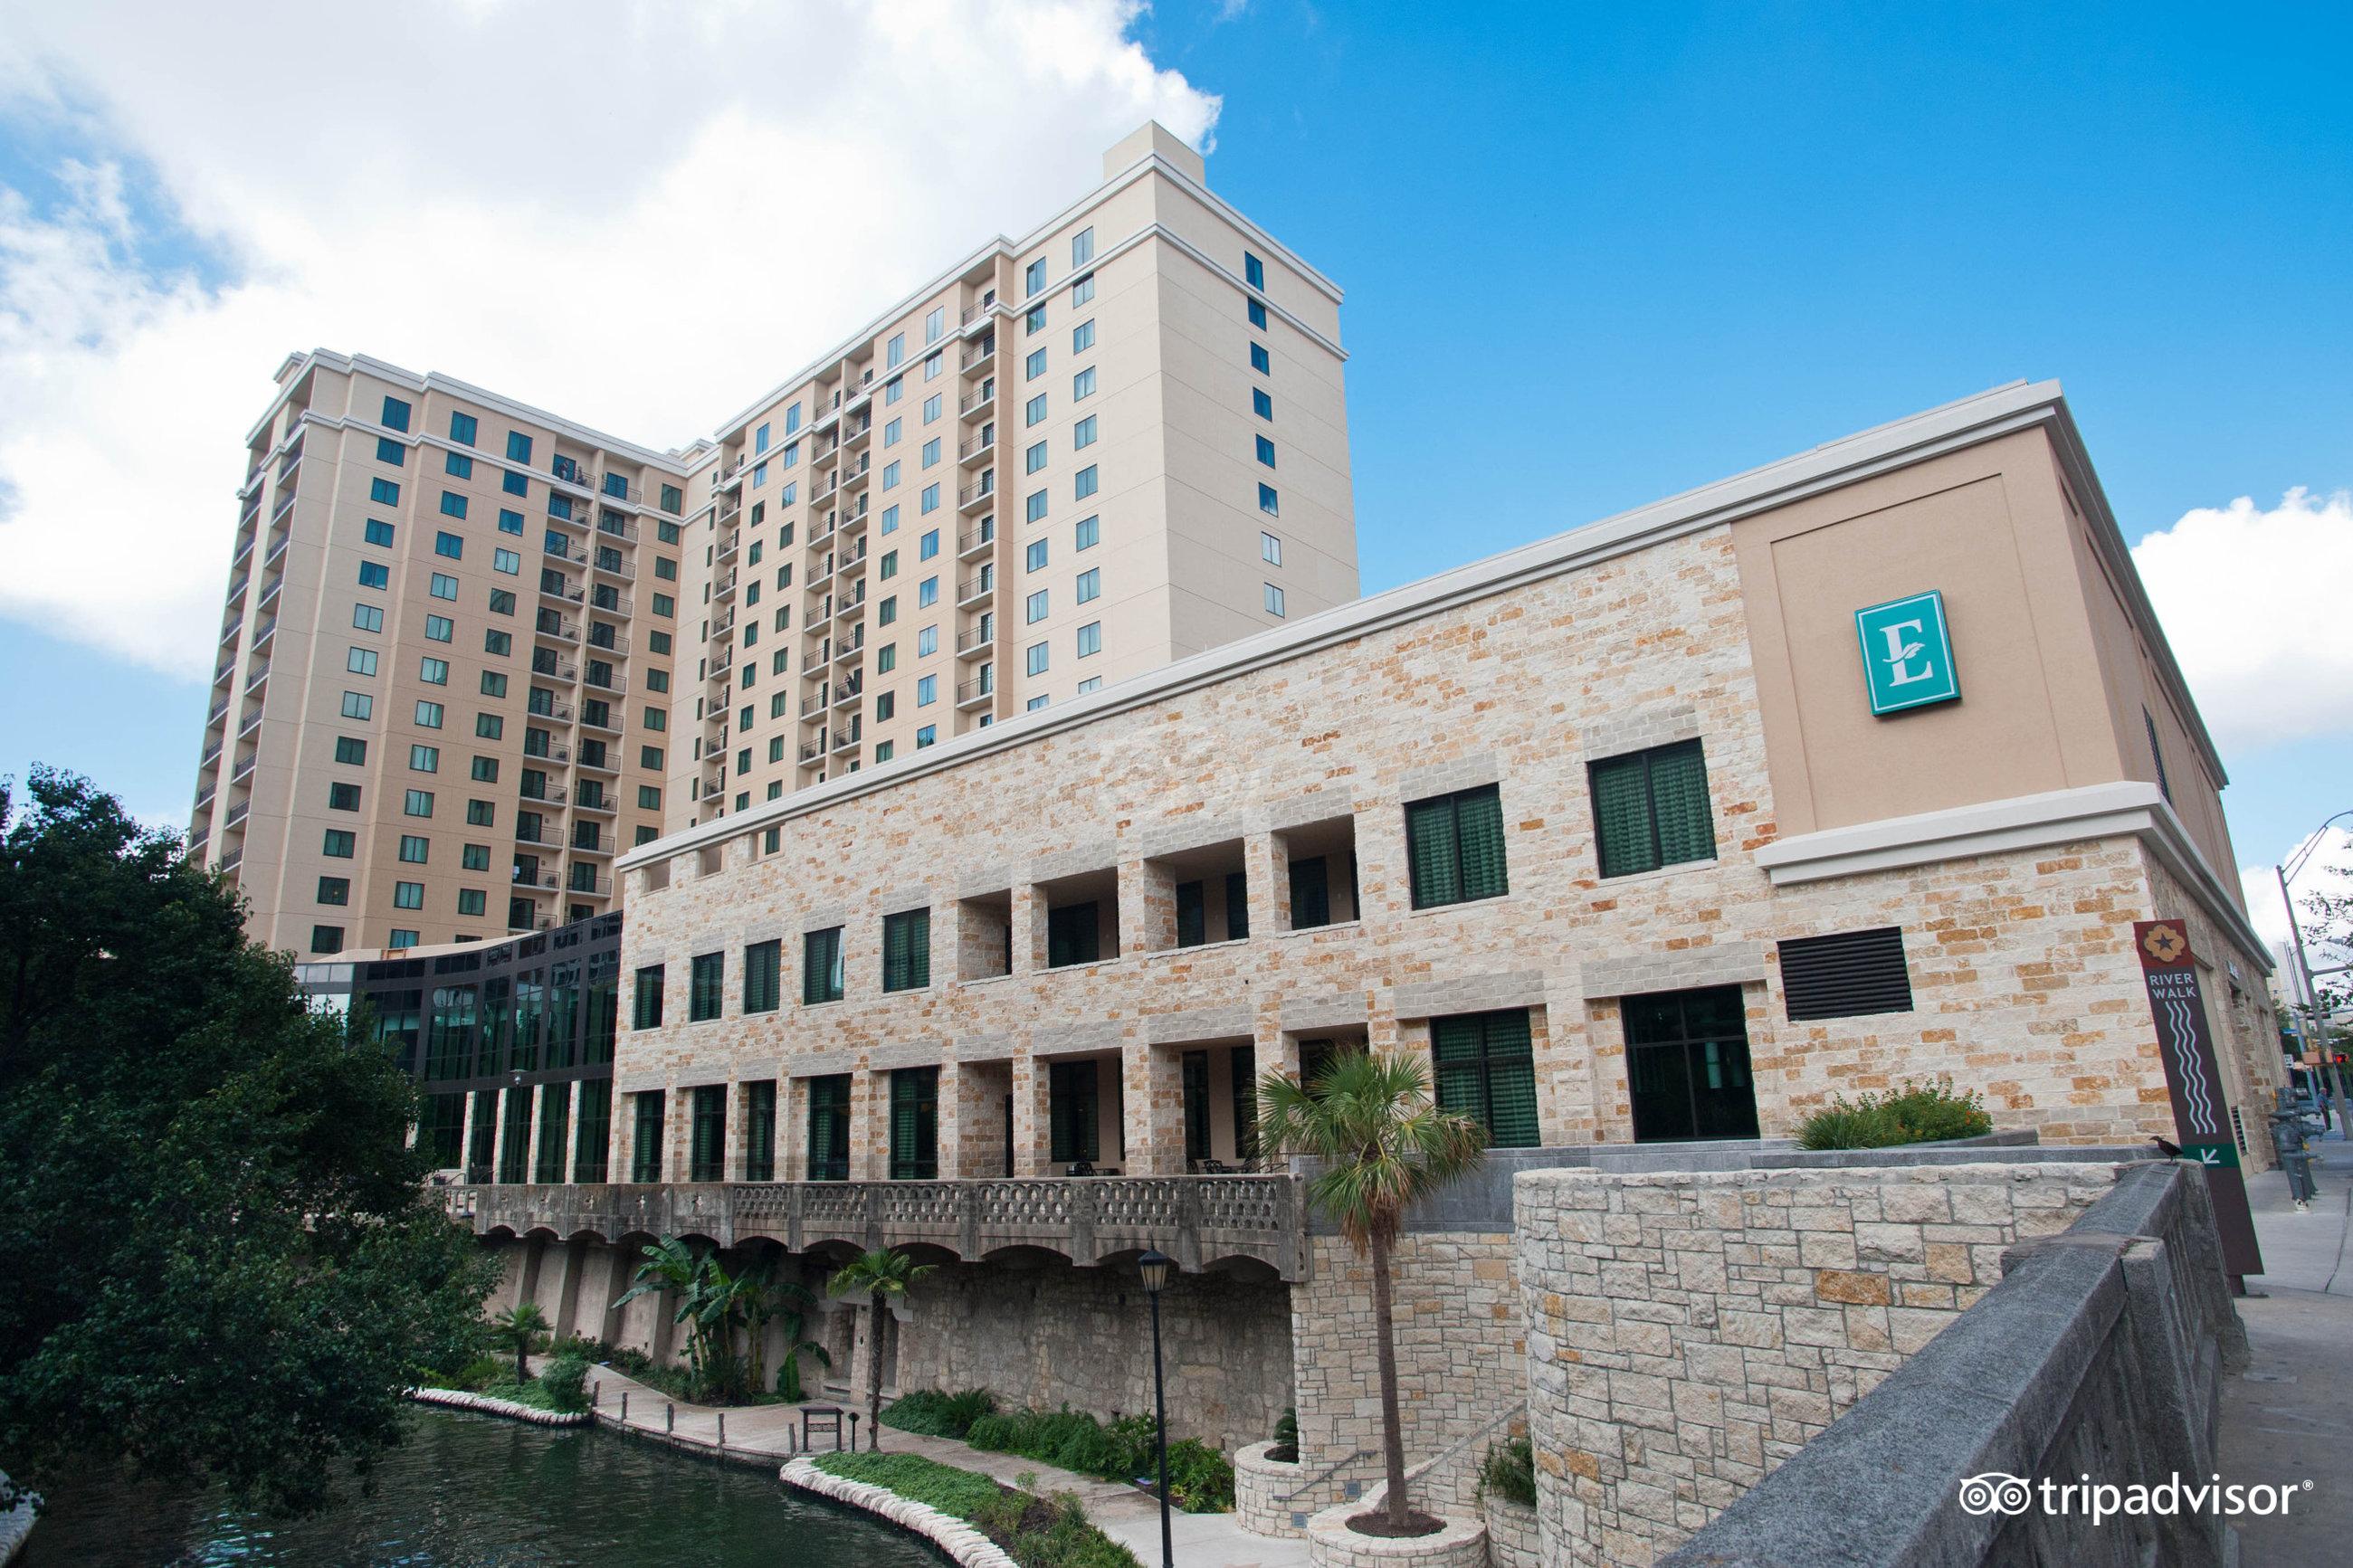 embassy suites by hilton san antonio riverwalk-downtown (tx) 2018